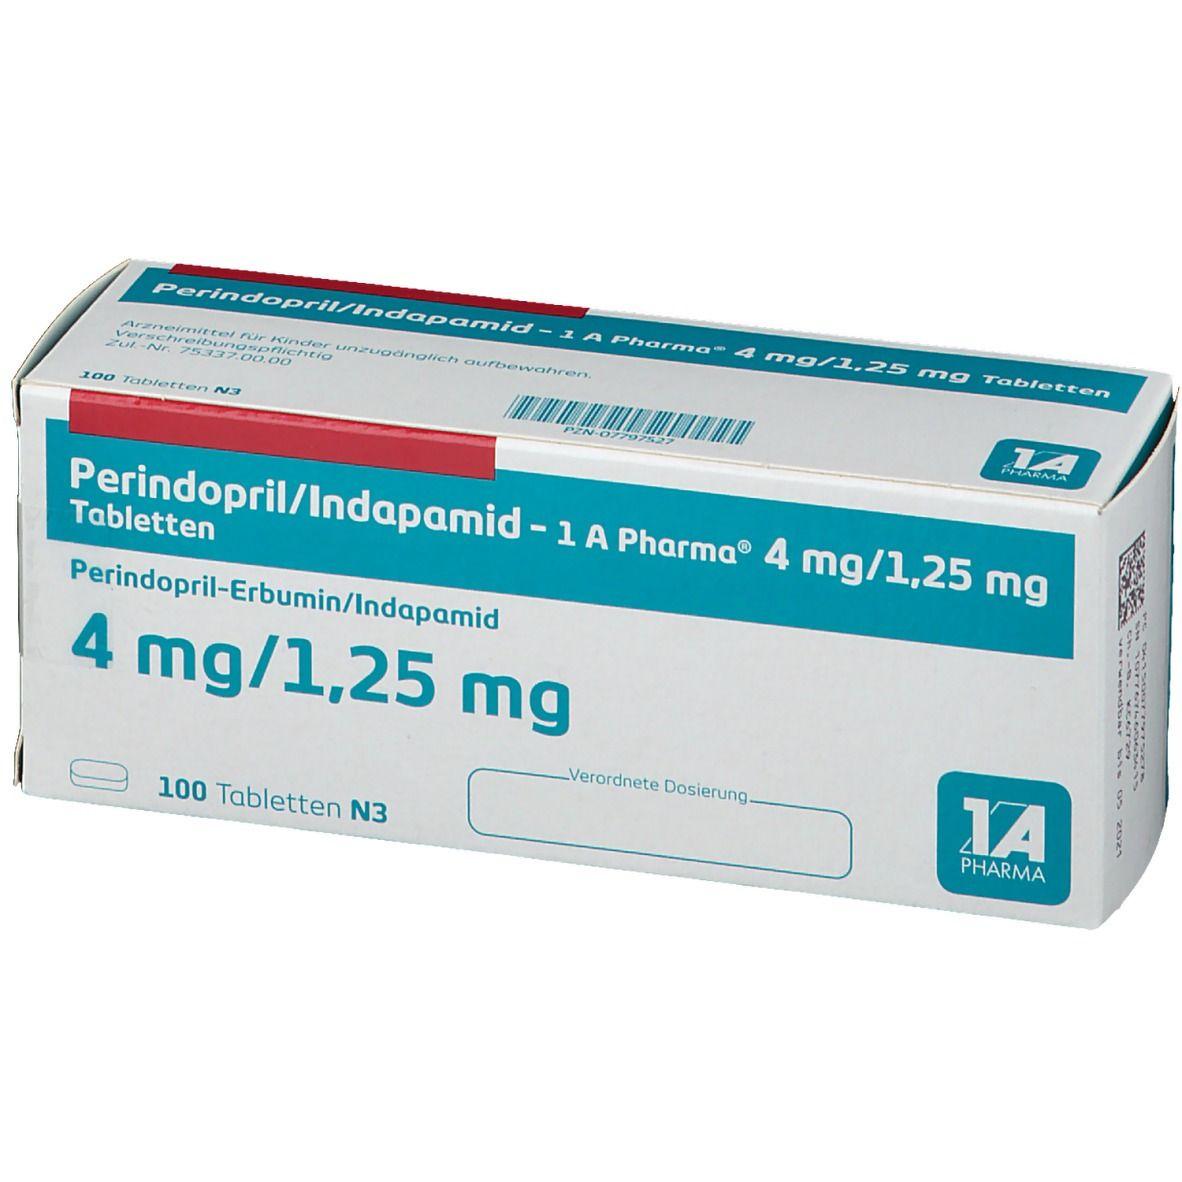 Perindopril/Indapamid   20 A Pharma® 20 mg/20,20 mg 2000 St   shop ...